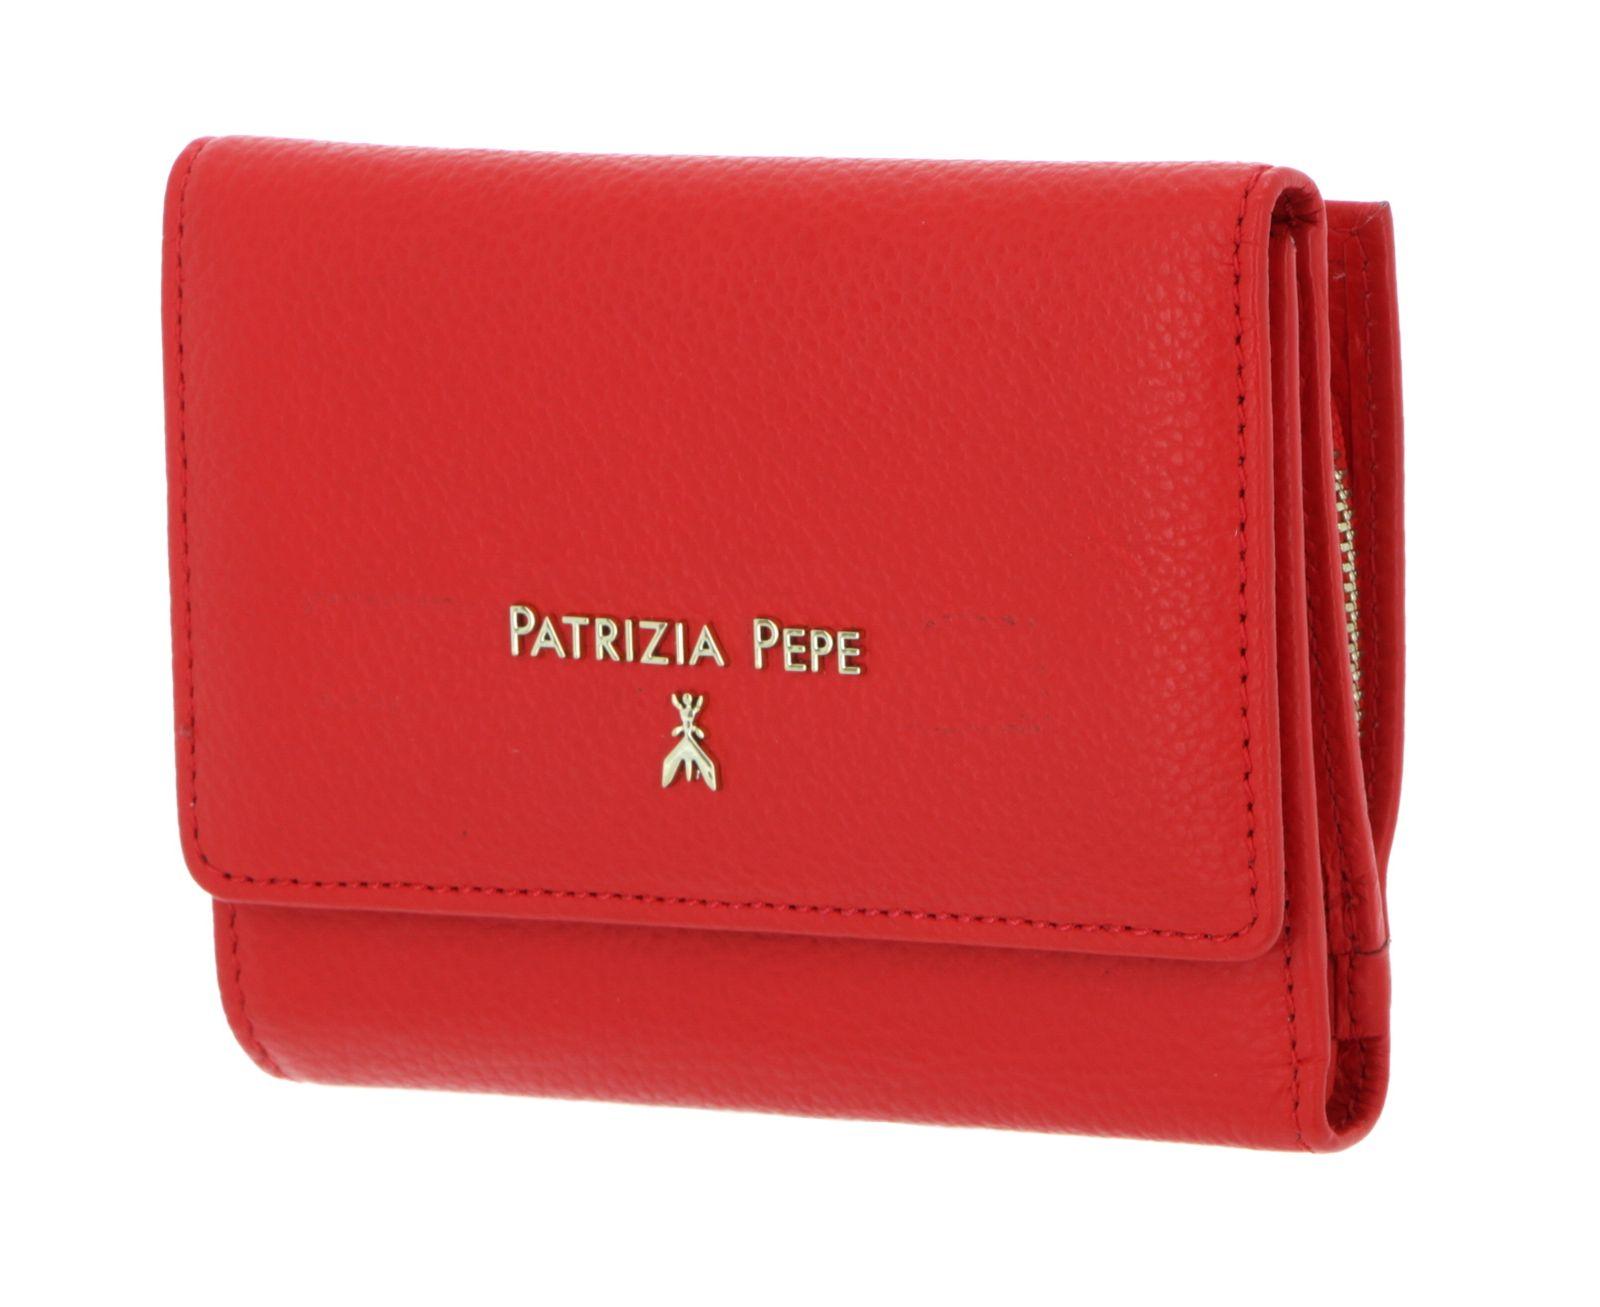 PATRIZIA PEPE City Wallet Lipstick Red